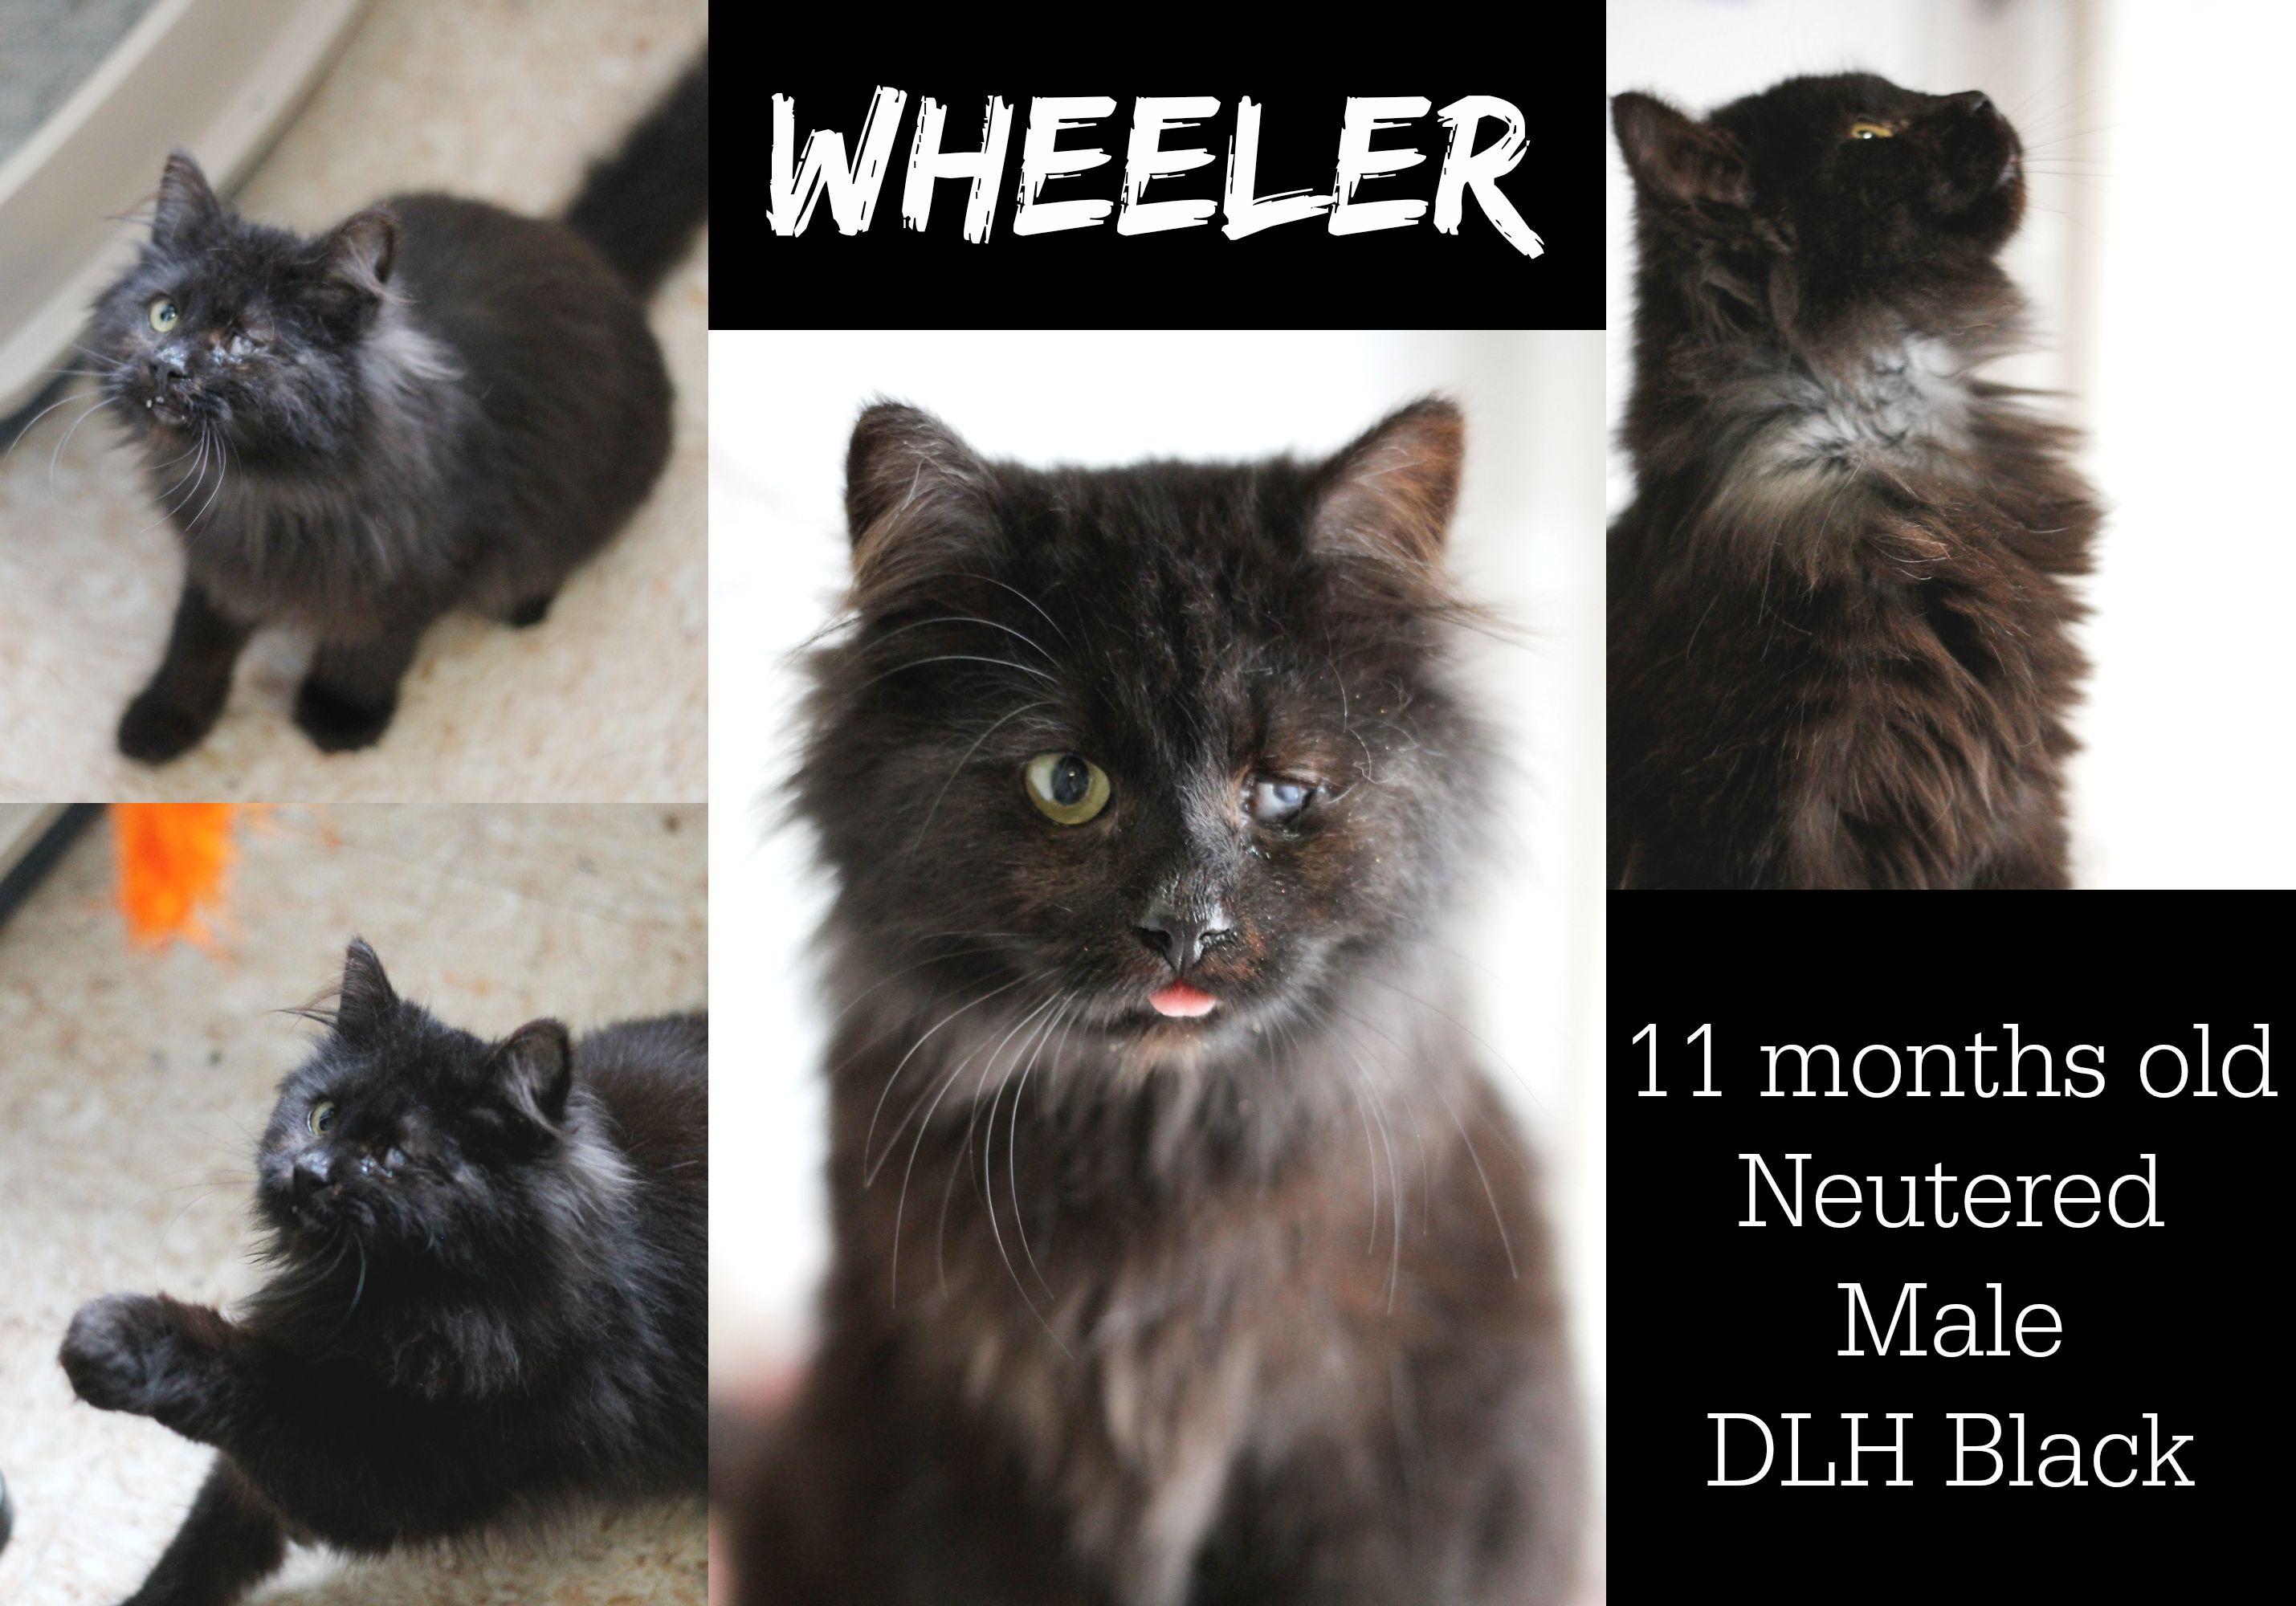 Available For Adoption Wheeler 11 Months Old Neutered Male Dlh Black Adoption Fee No Fee Apply Www Hsomc Org Application Adopt Cat Shelter Neuter Kitten